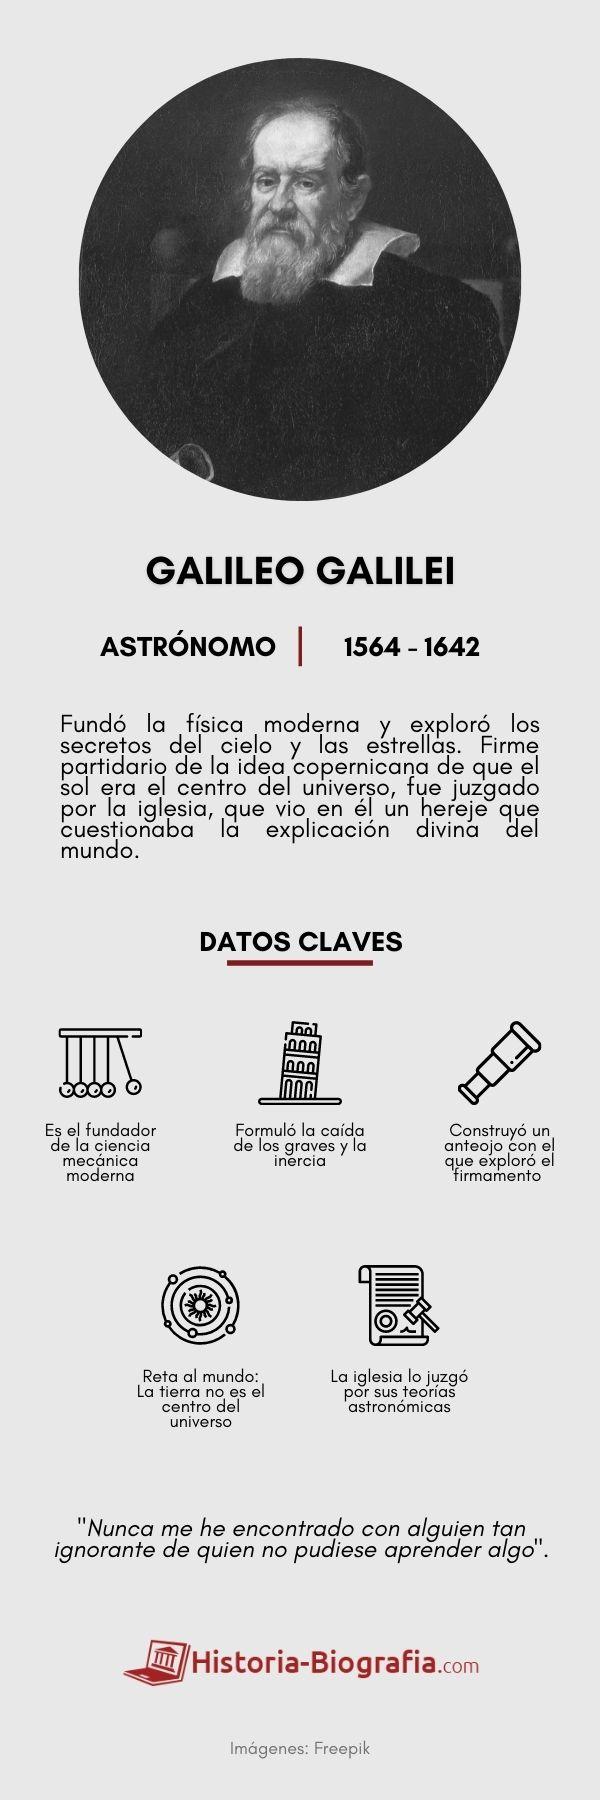 Infografía de Galileo Galilei